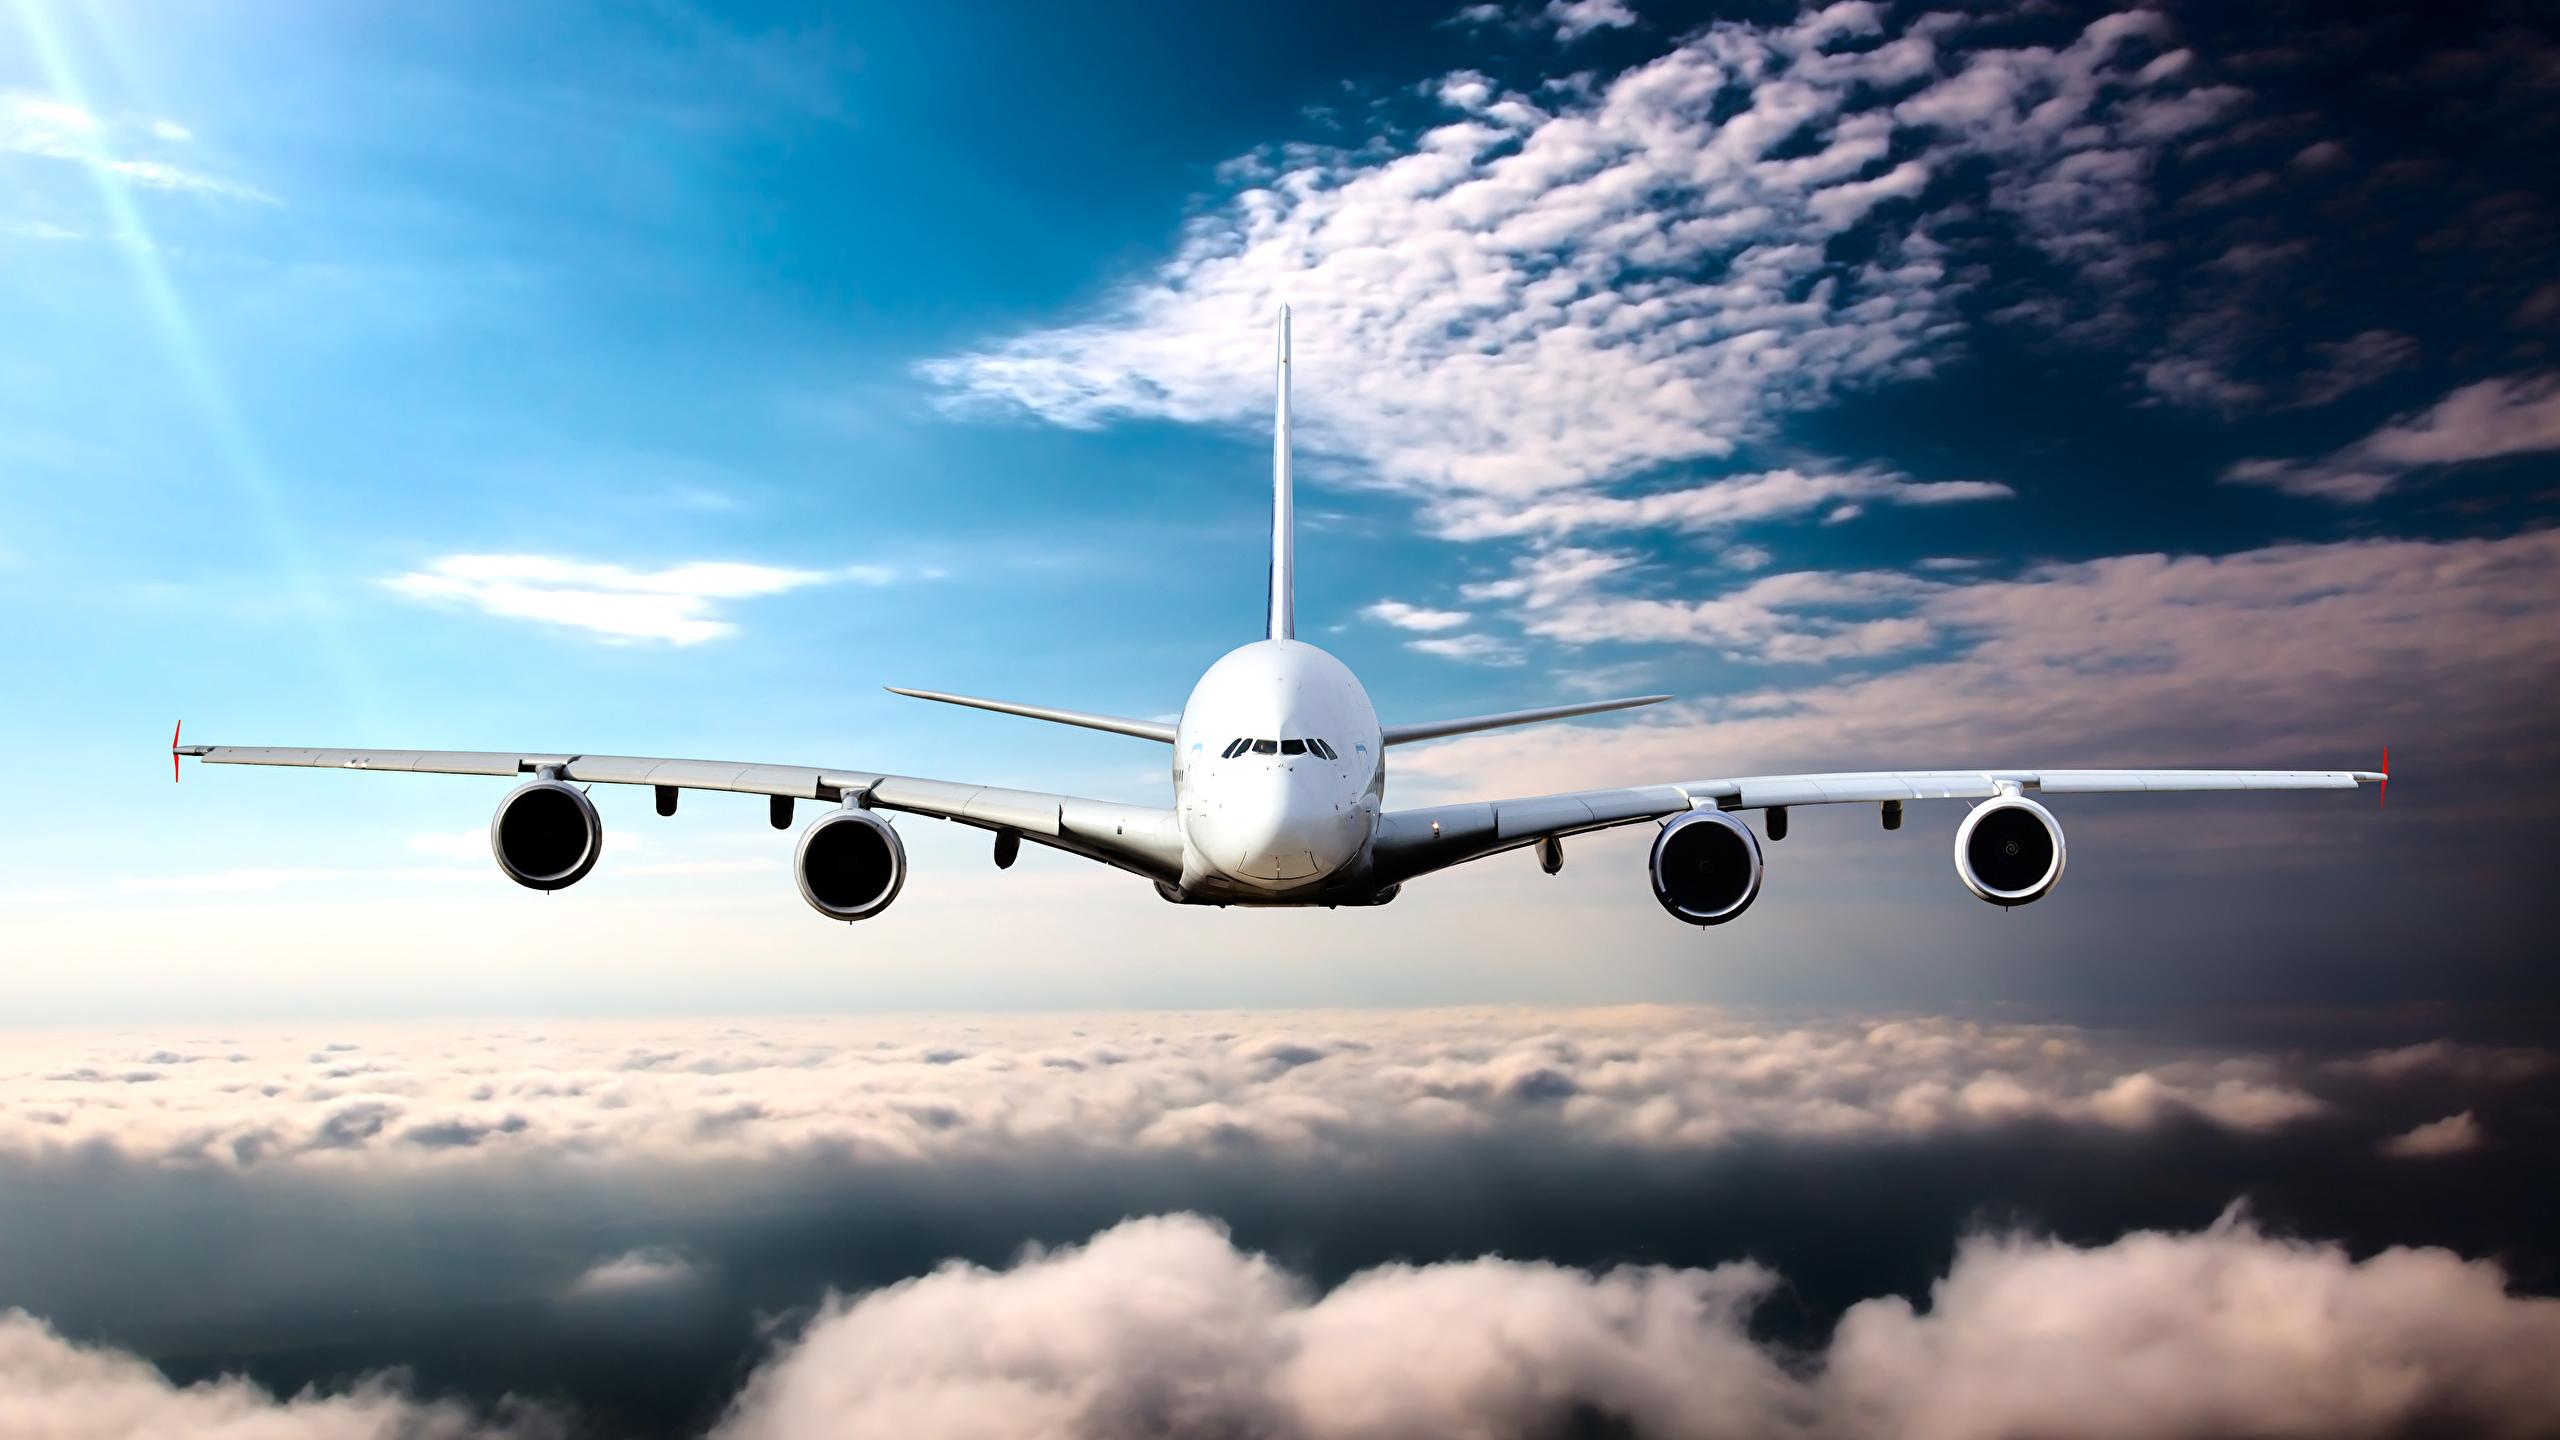 Нужна картинка самолет